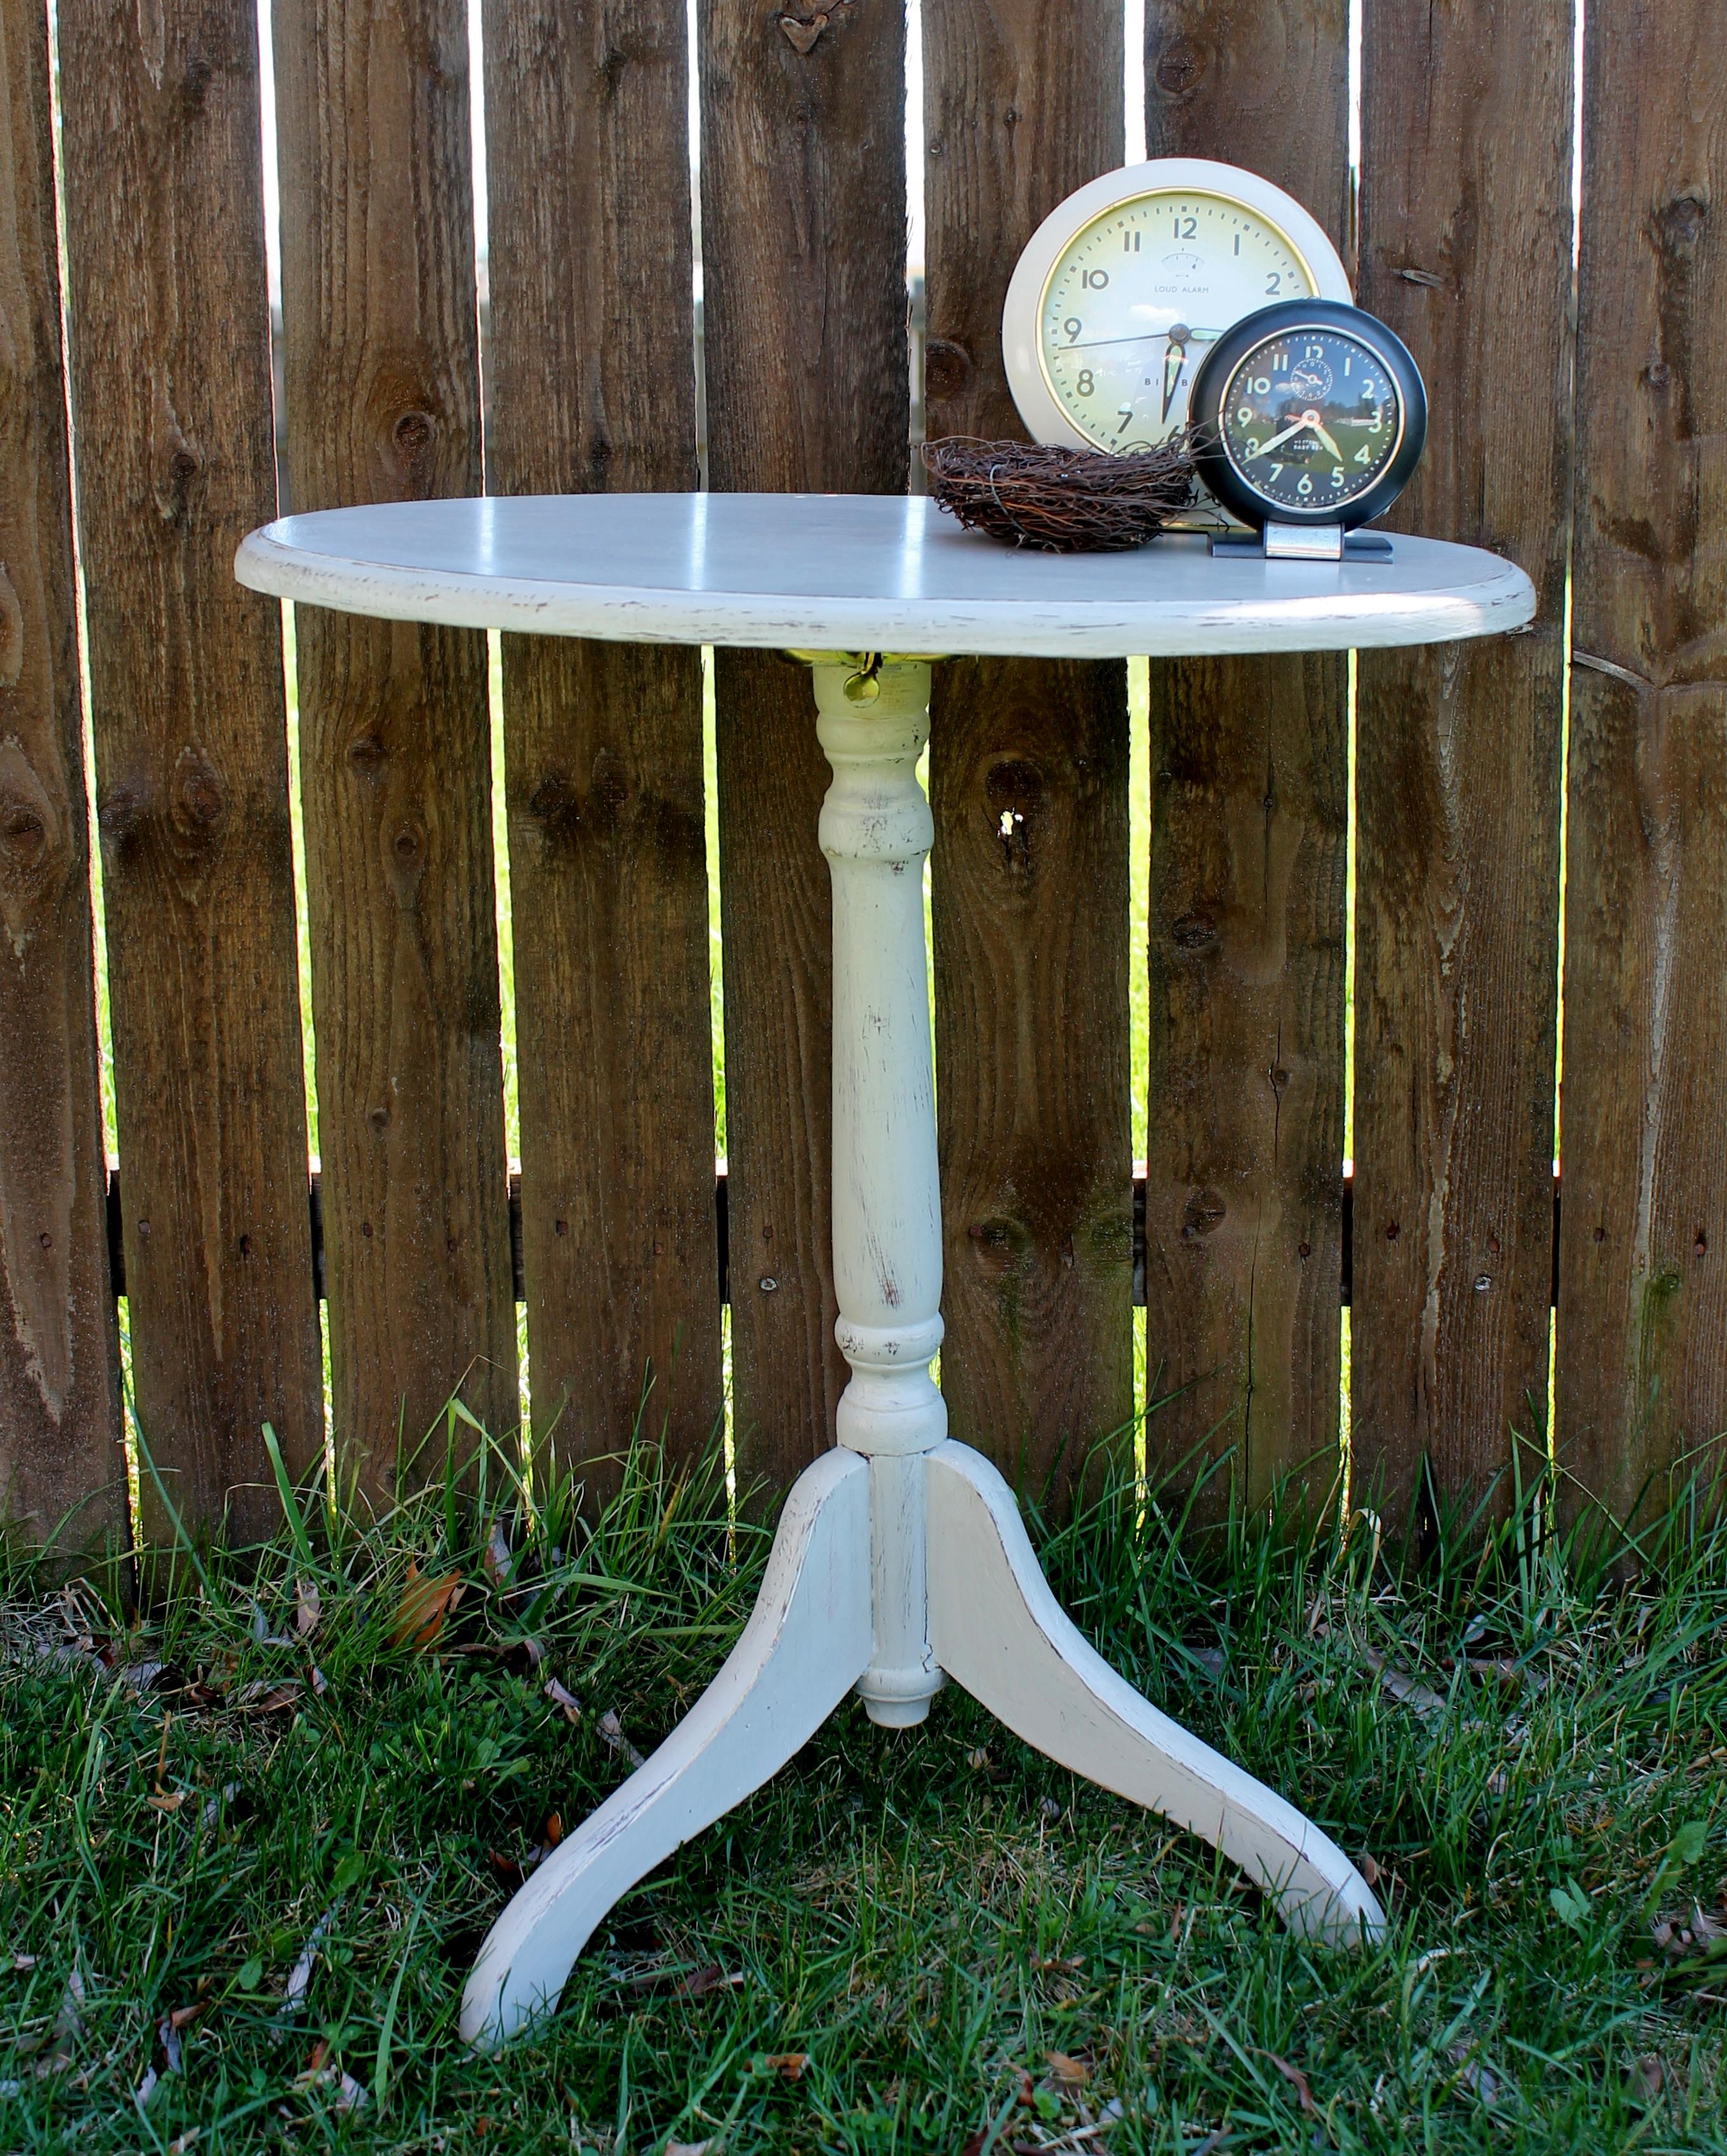 Chalk painted tilt top table with vintage clocks